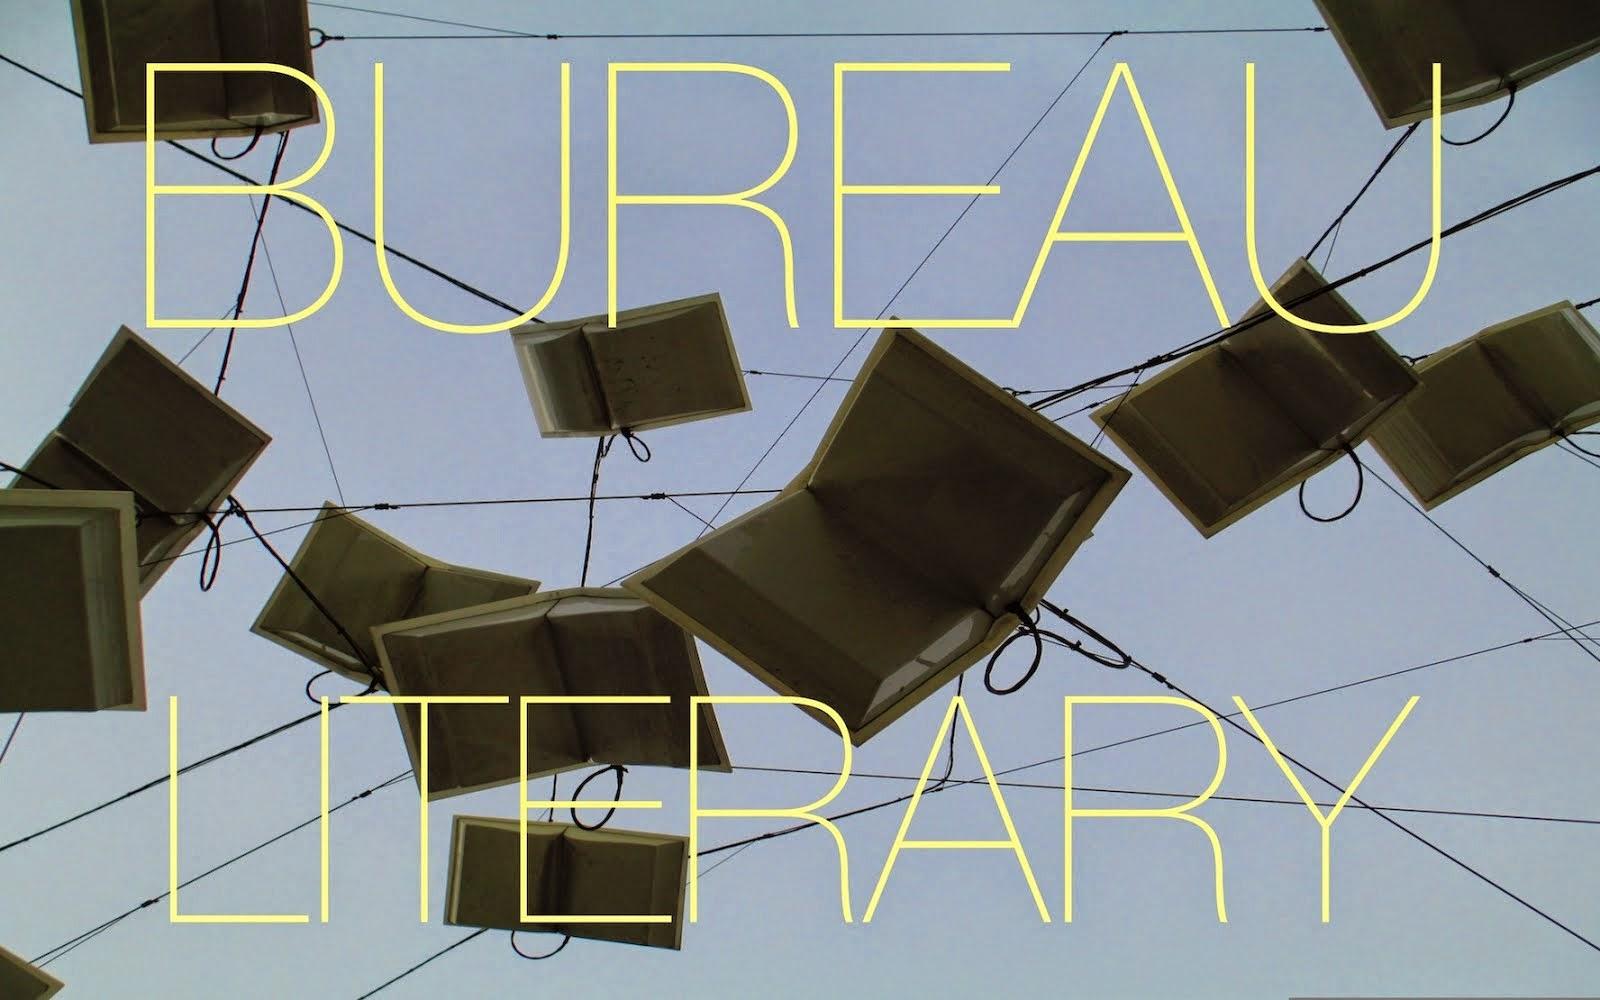 Tap: BUREAU LITERARY